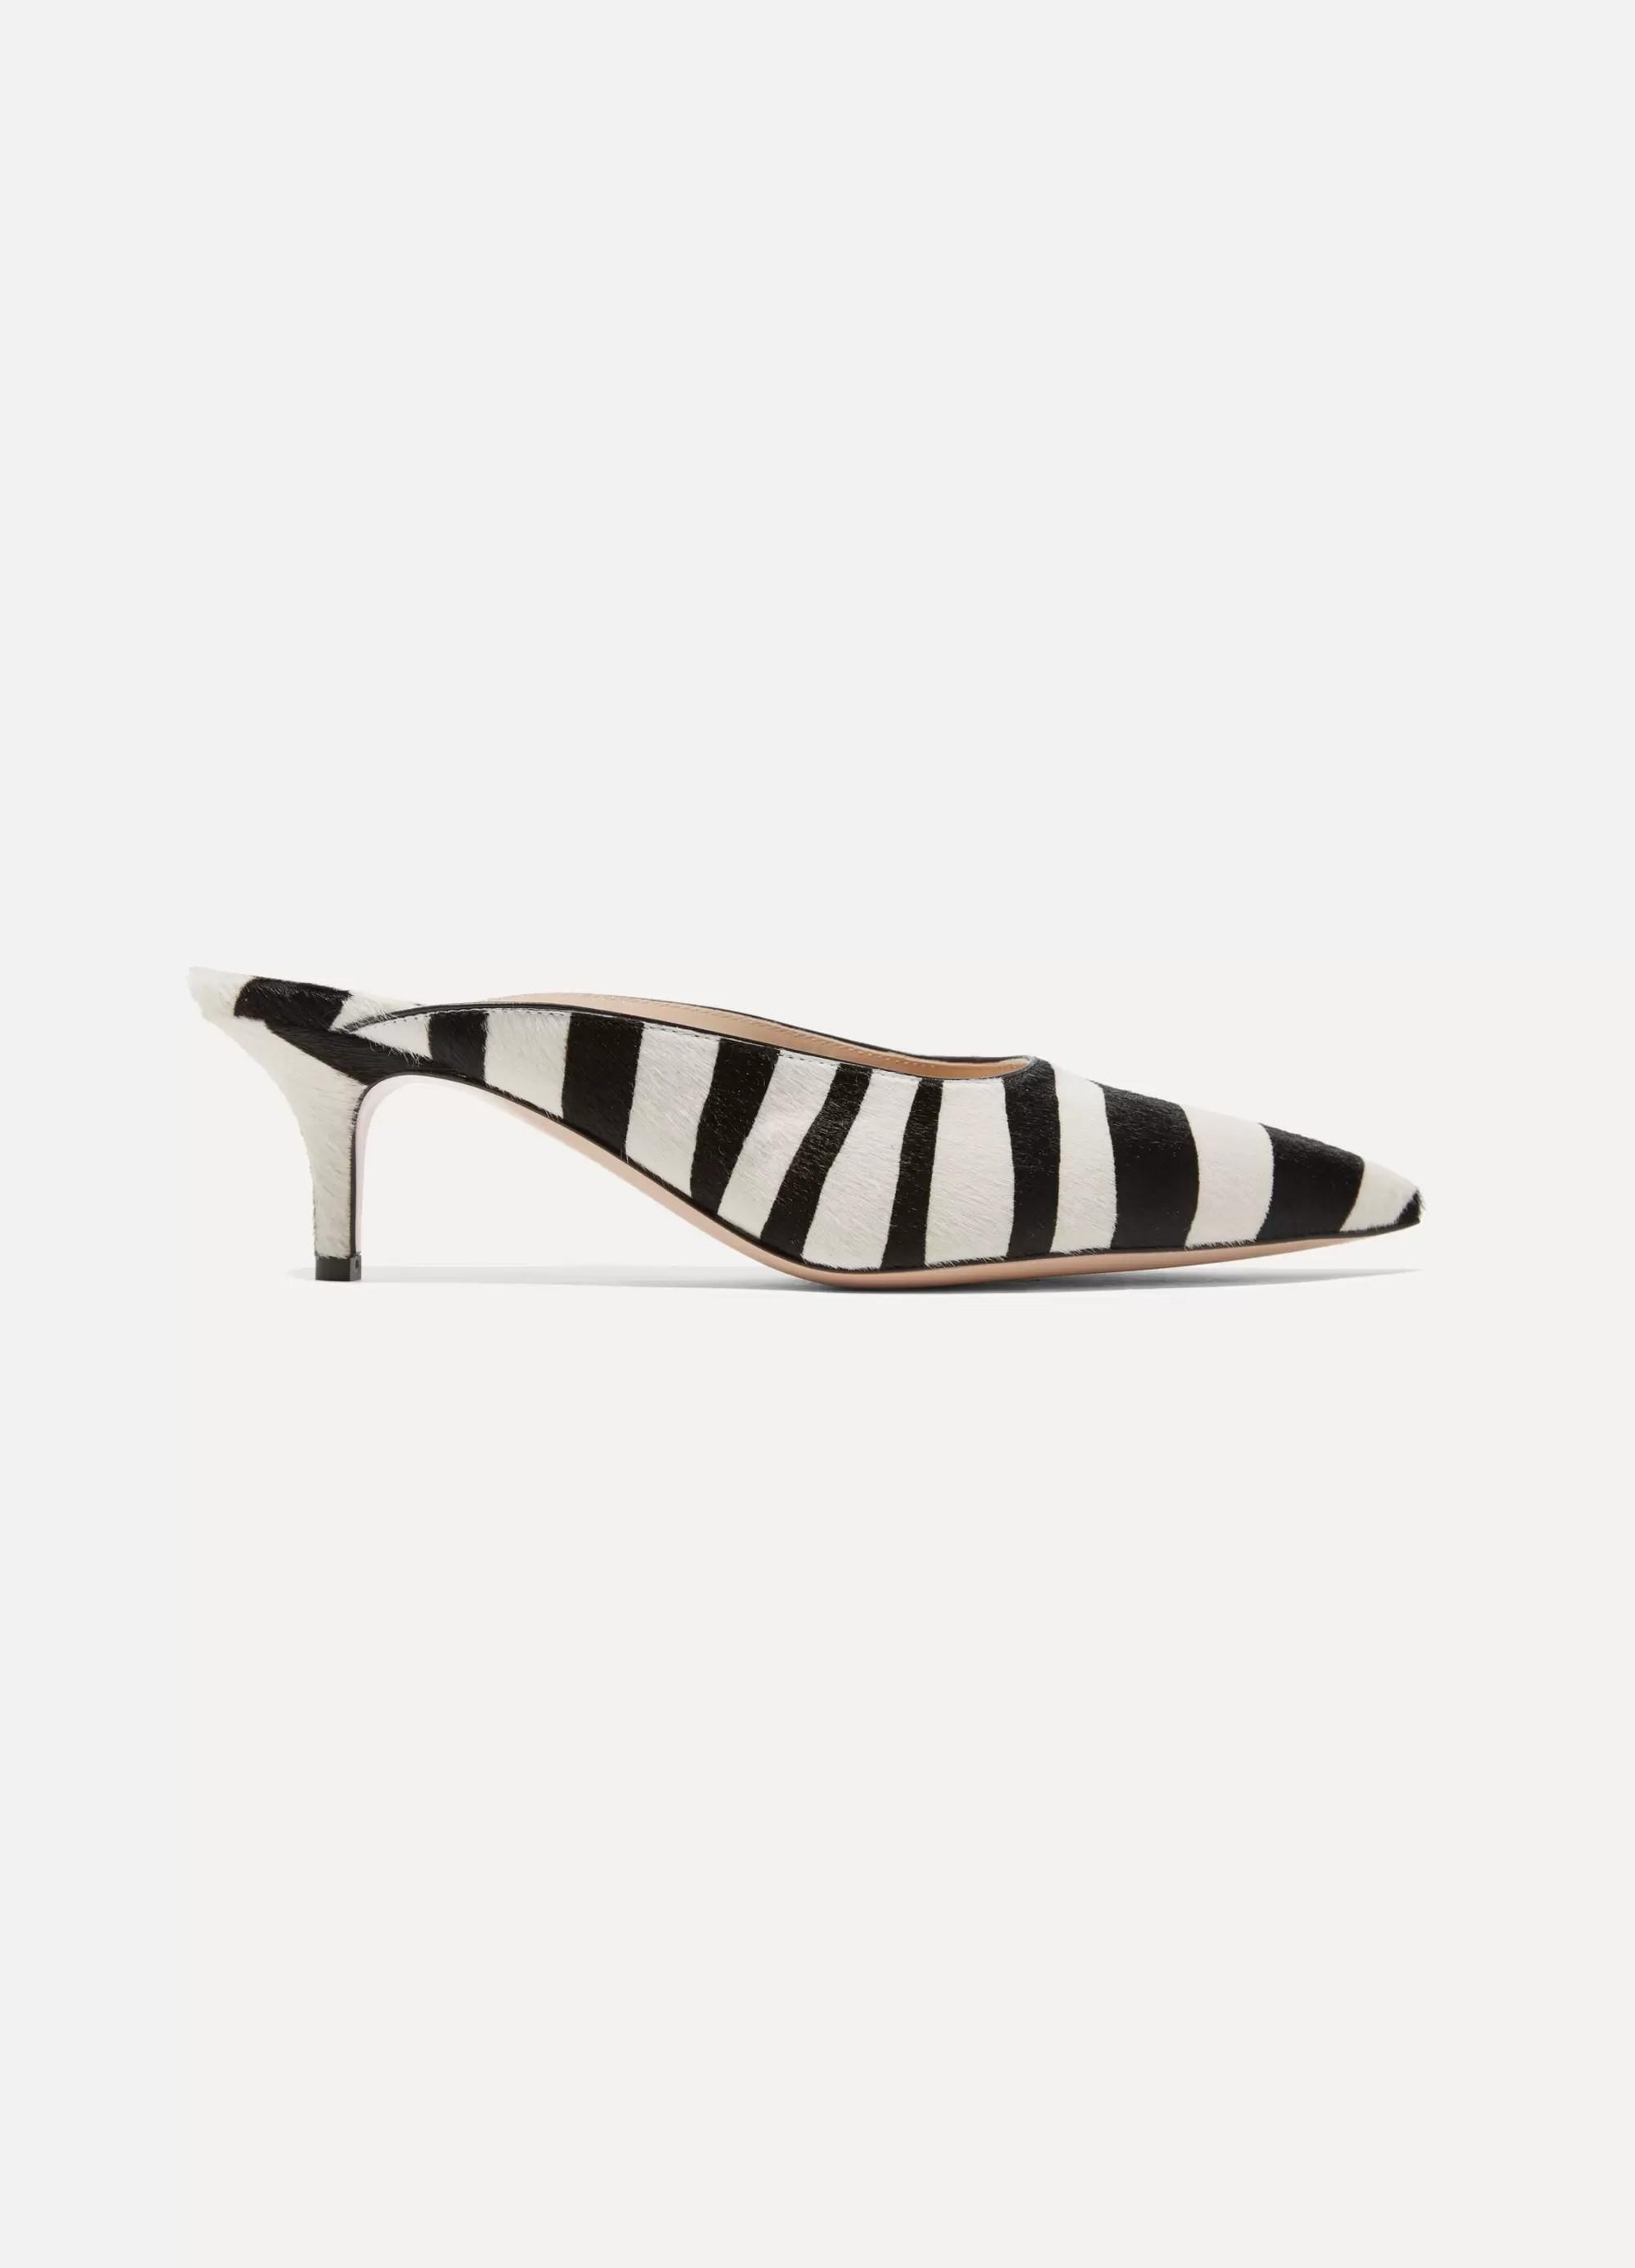 Gianvito Rossi 55 zebra-print calf hair mules